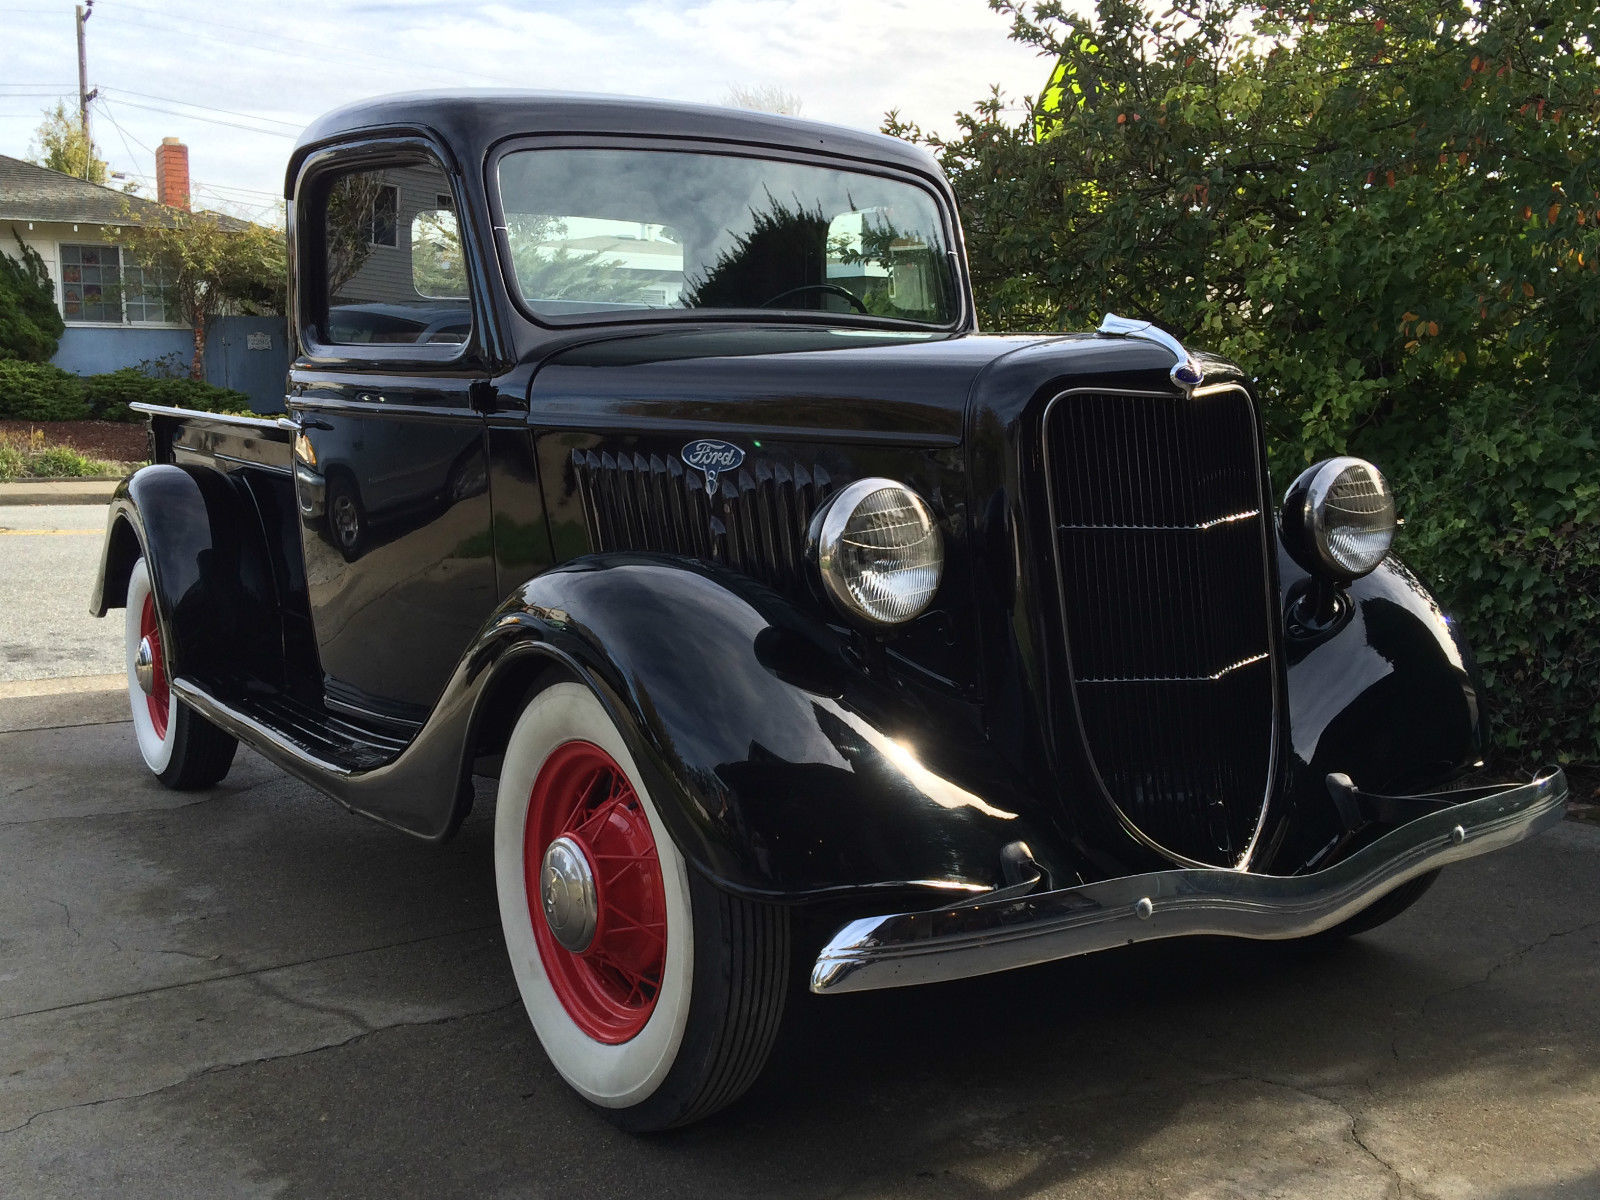 1935 ford pickup restored flathead powered beauty all steel. Black Bedroom Furniture Sets. Home Design Ideas